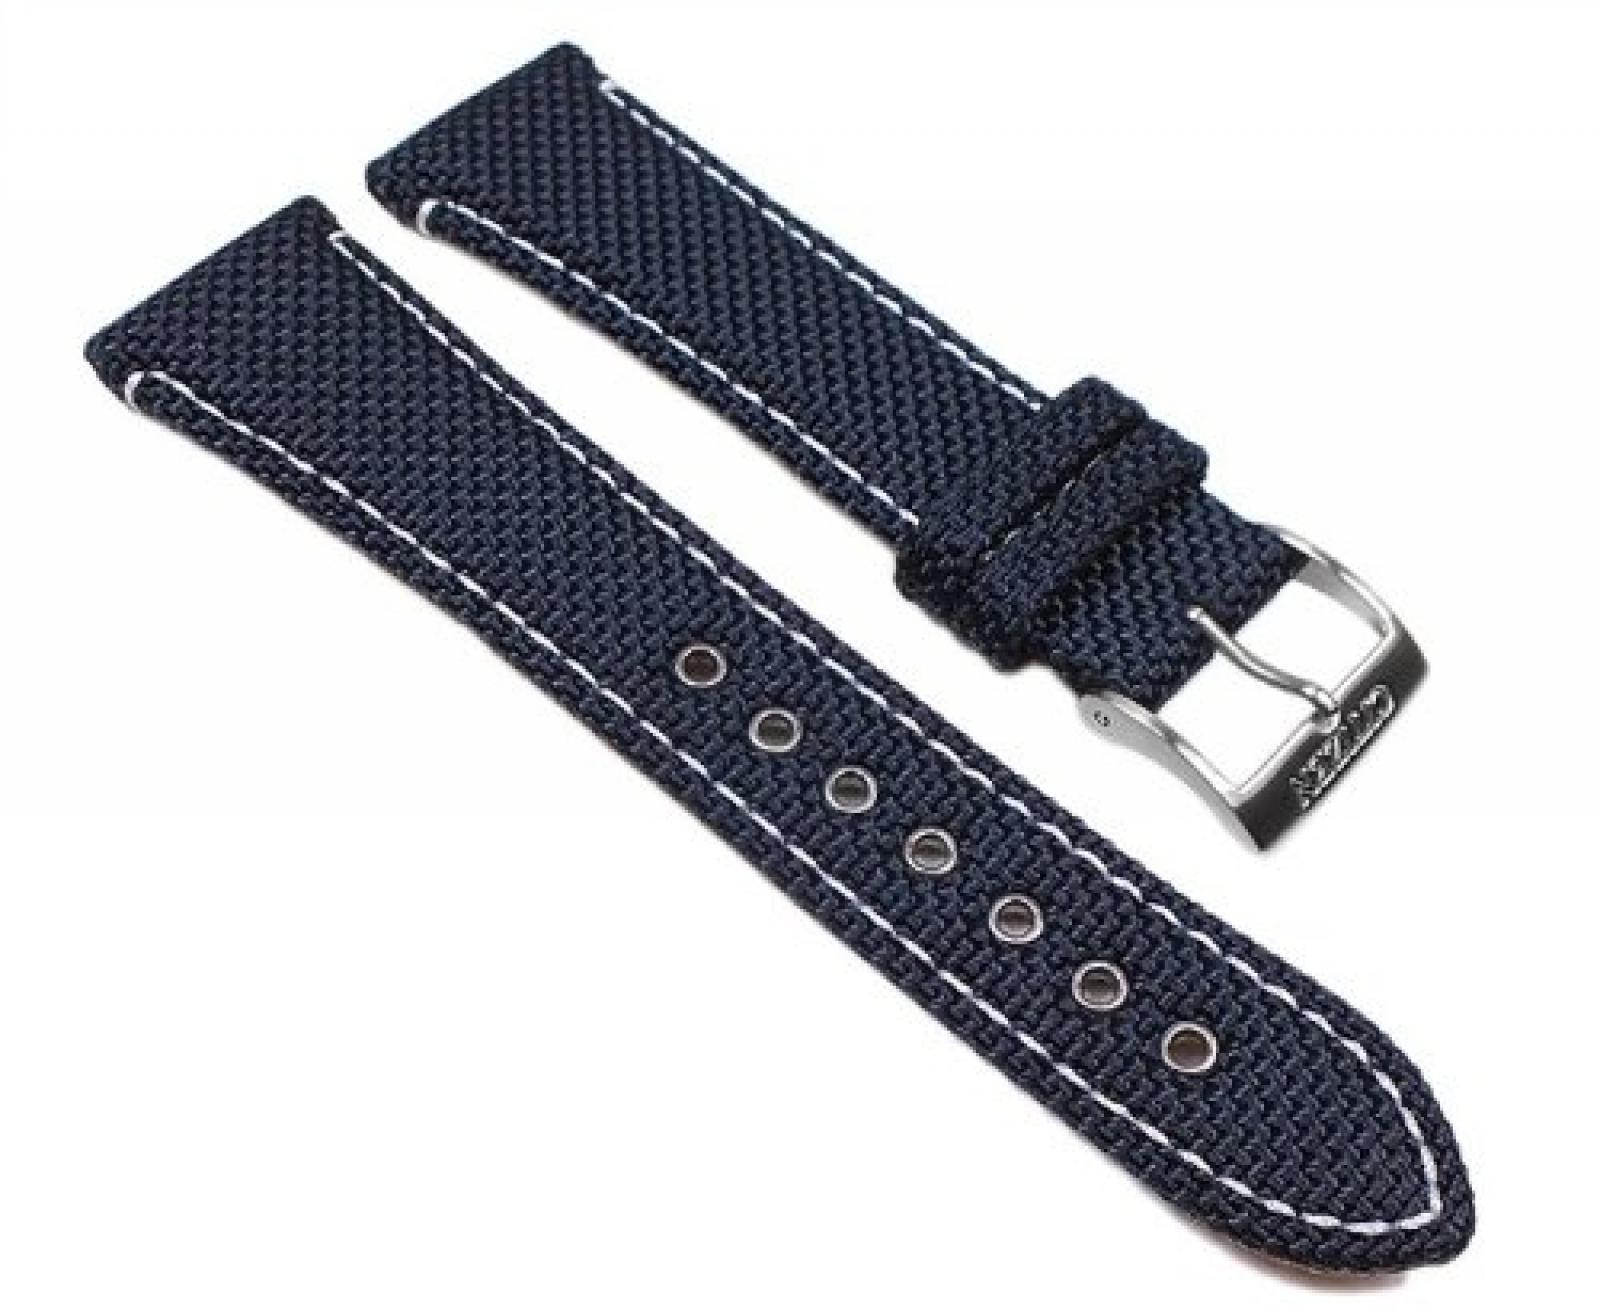 Citizen Marken Ersatzband Uhrenarmband Textil / Leder - Blau / Weiß 22mm für u.a BM6686-21A